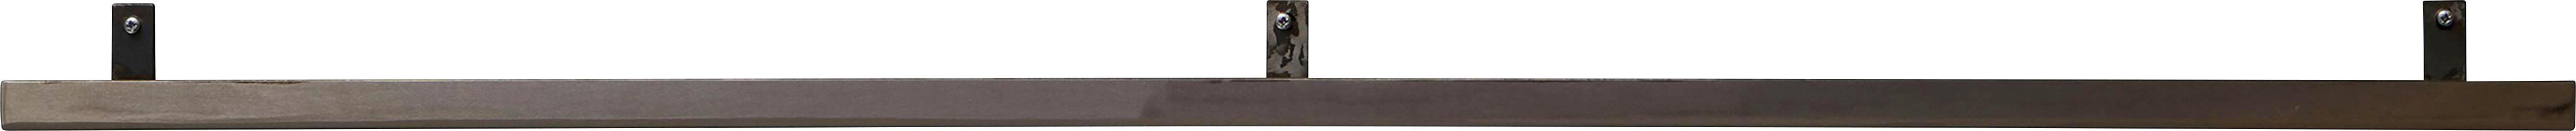 Bemerkenswert Wandboard Metall Ideen Von Affordable Grau Grau Modern With Grau With